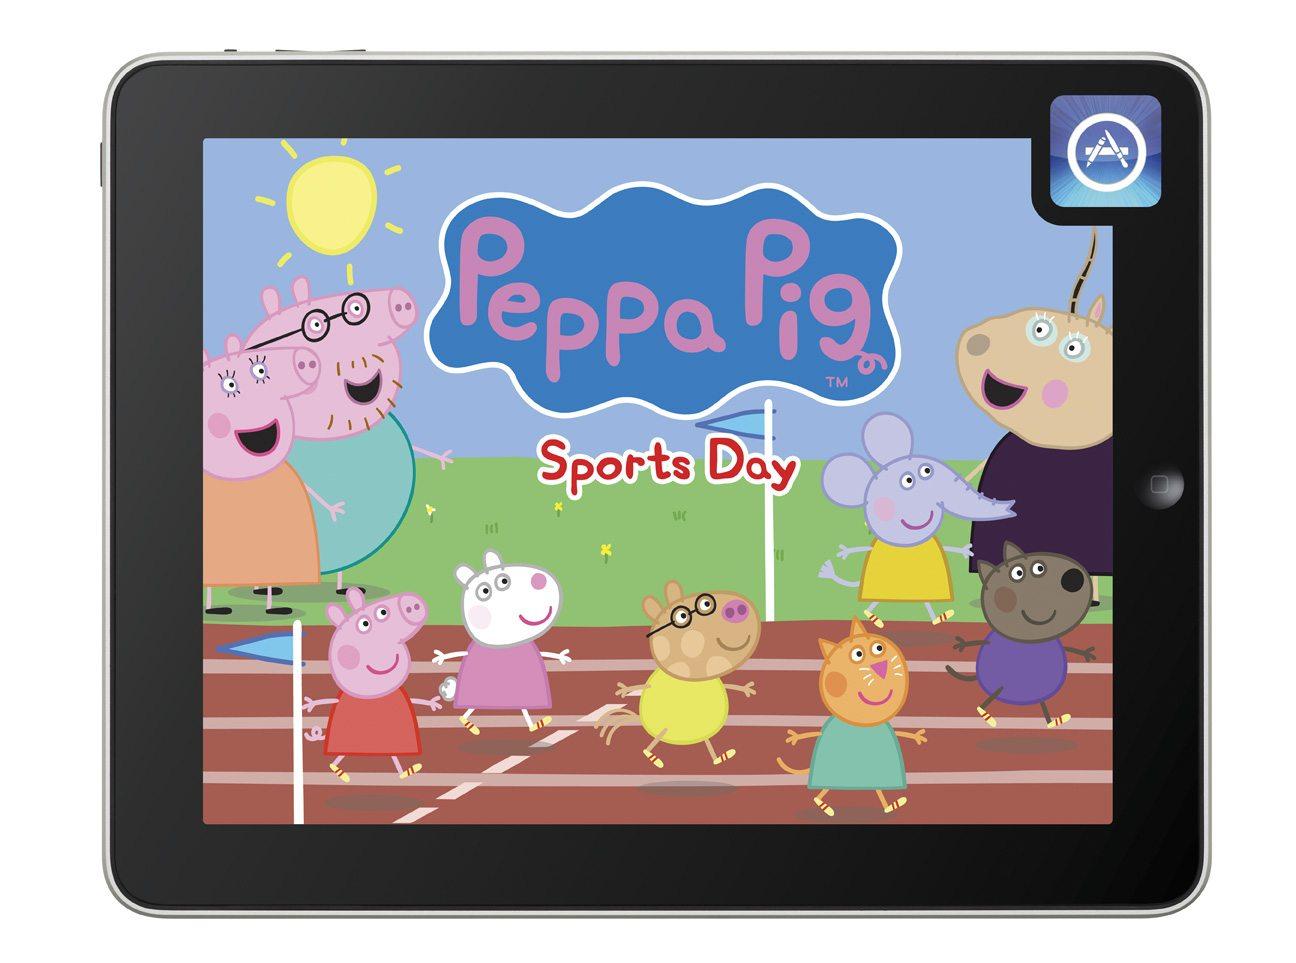 Peppa Pig Sports Day Screen Shots